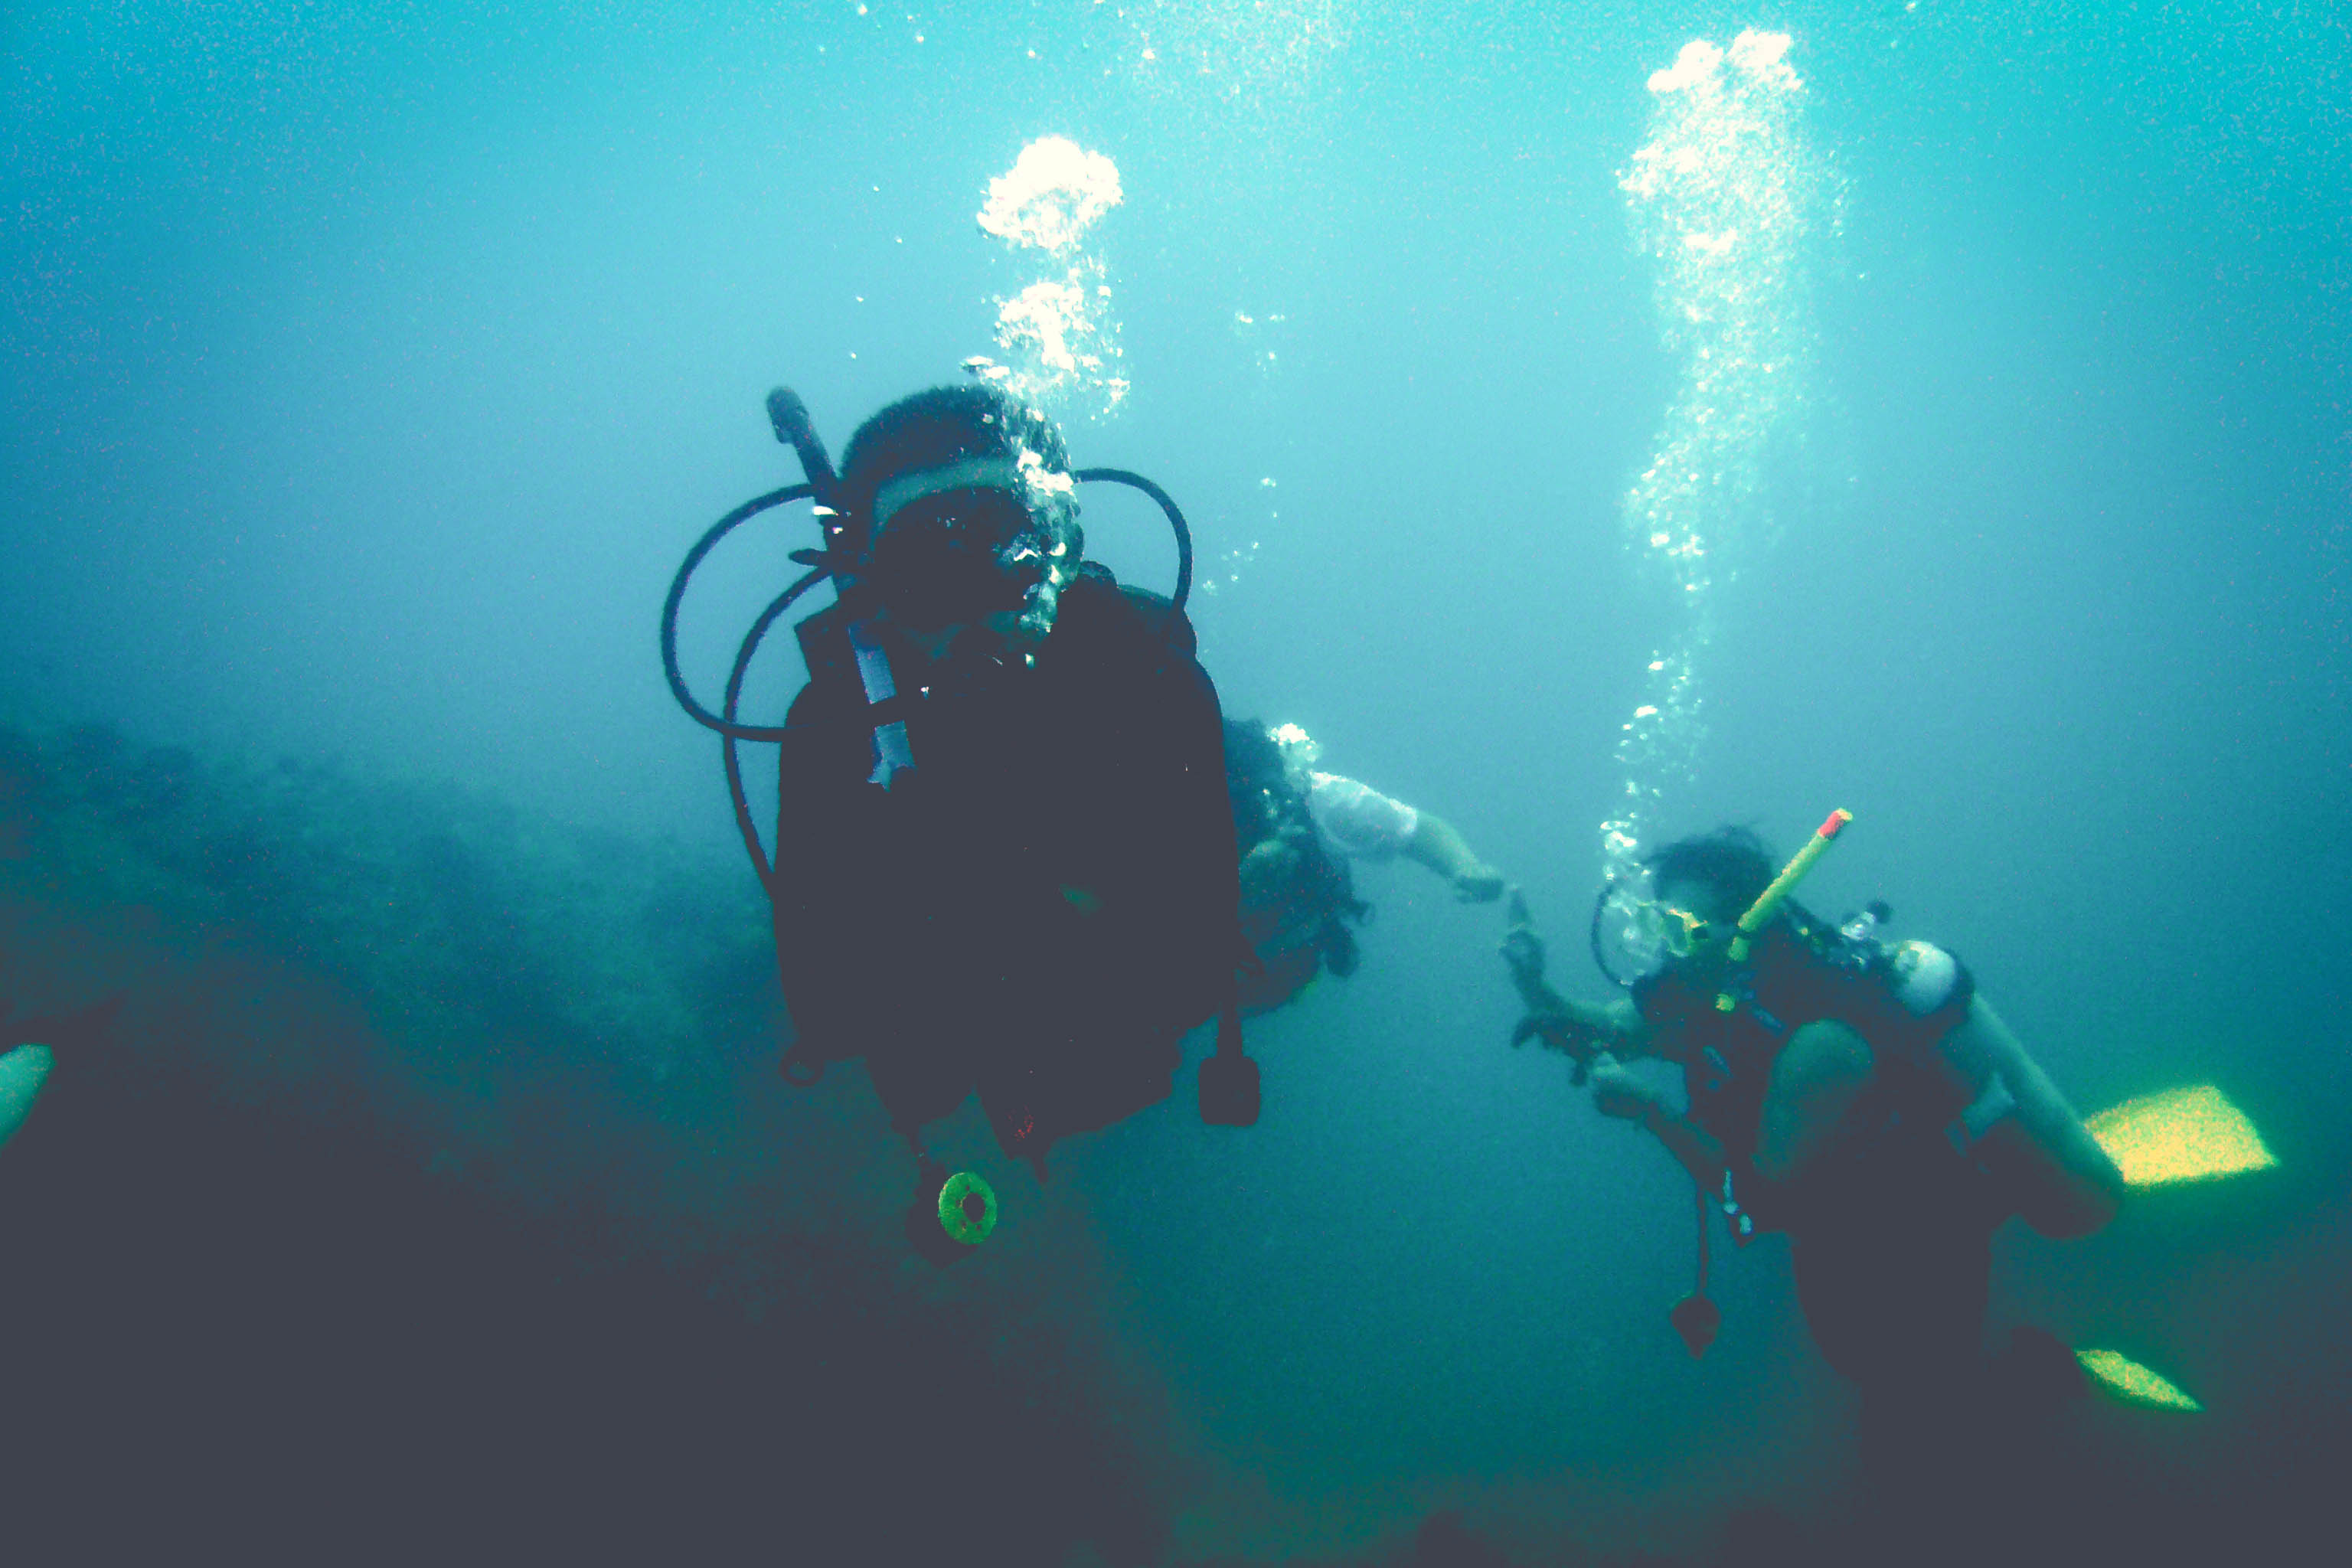 2008-04-26 17-44-47 Tioman Island - Soyak